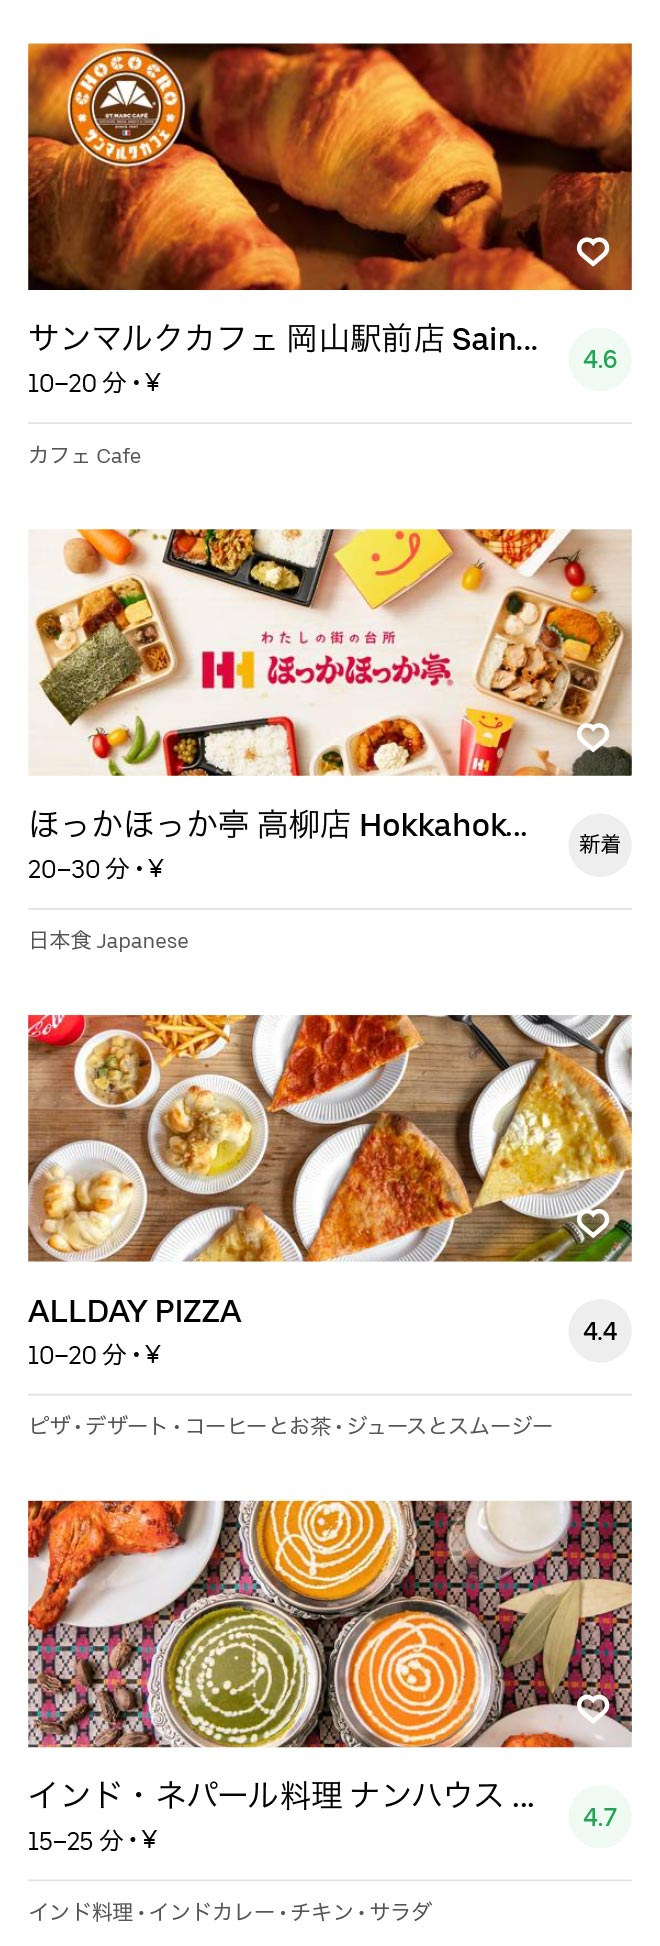 Okayama menu 2007 06